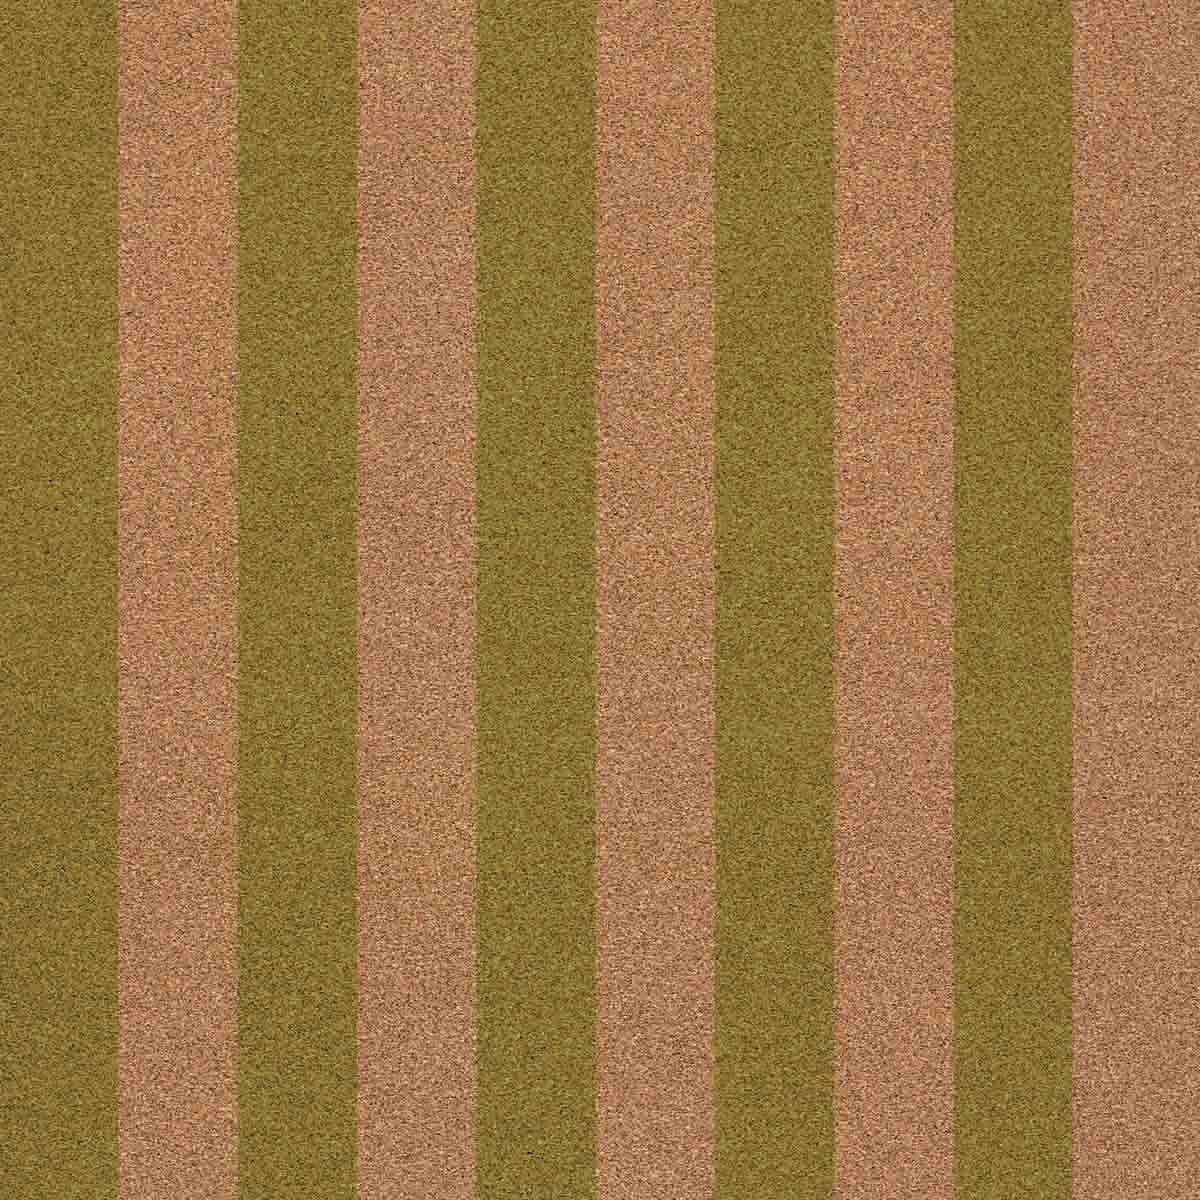 Decorative cork thin paper Straight Marine Sulphur Spring Cork